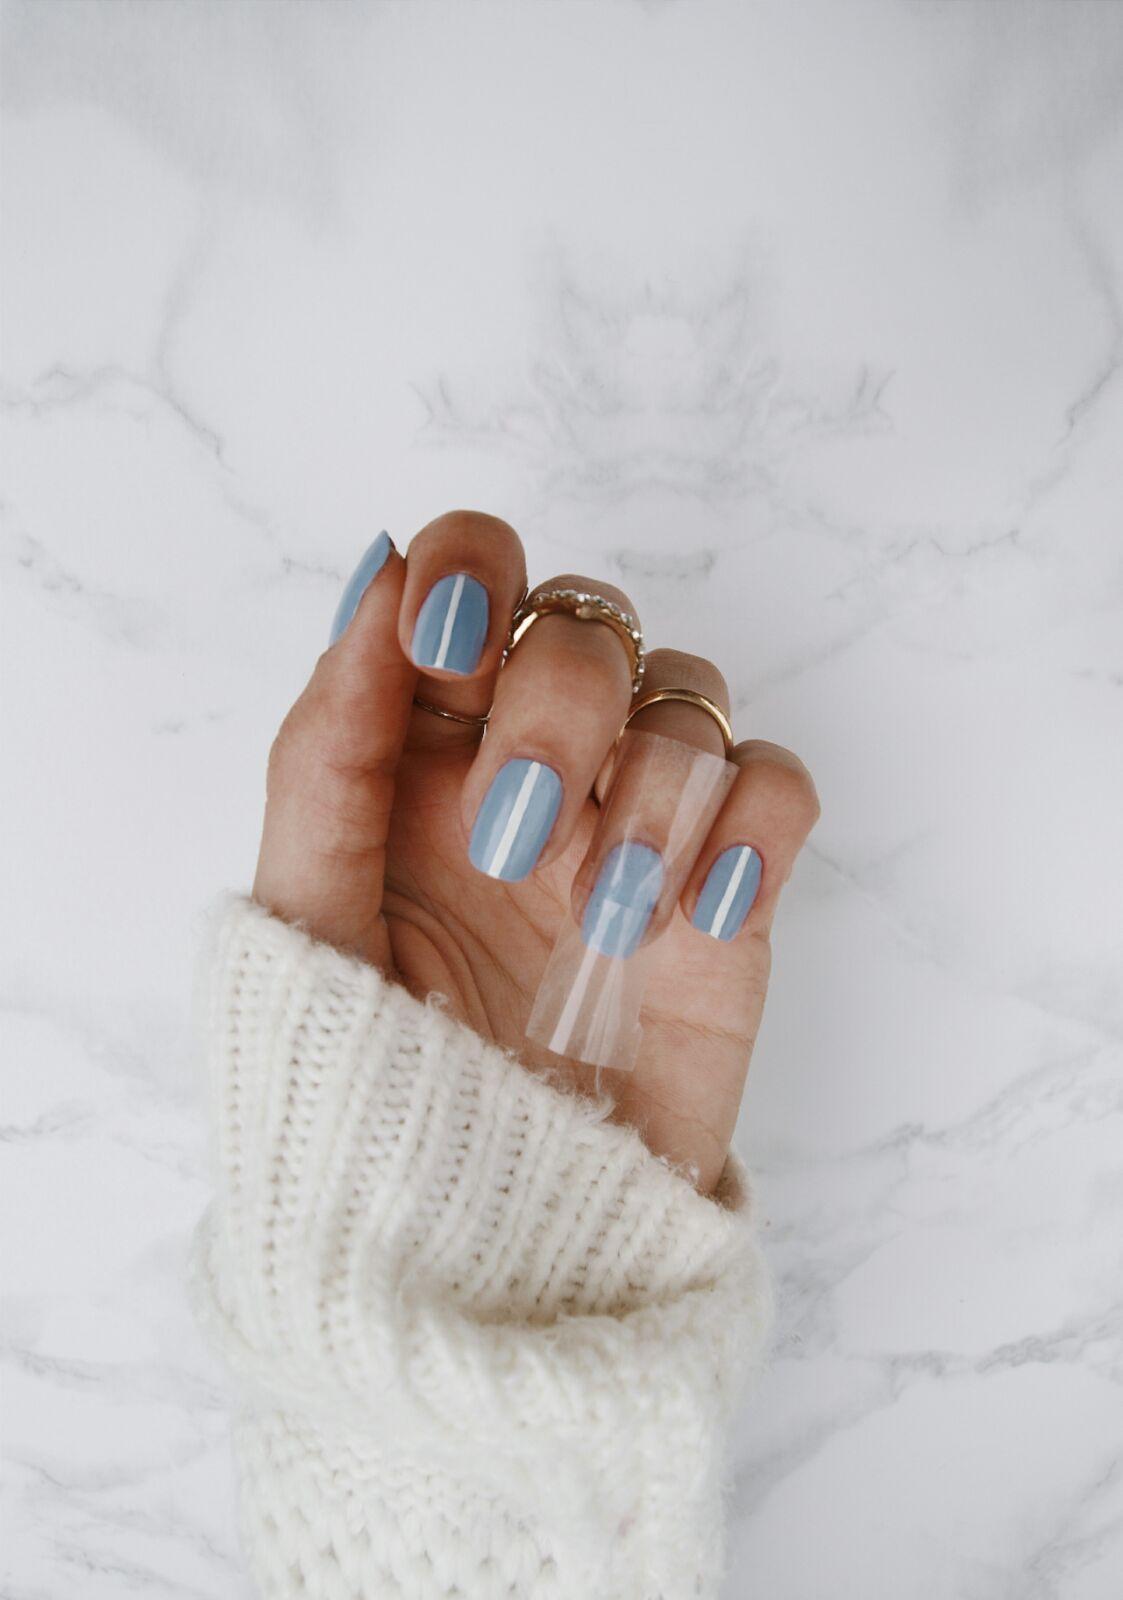 nail-blueandwhite-striped-coastalandco-blog-manucure-manicure-beauty-beaute-belleza-manicura-beige-white-nude-sephora-kiko-mac-nars